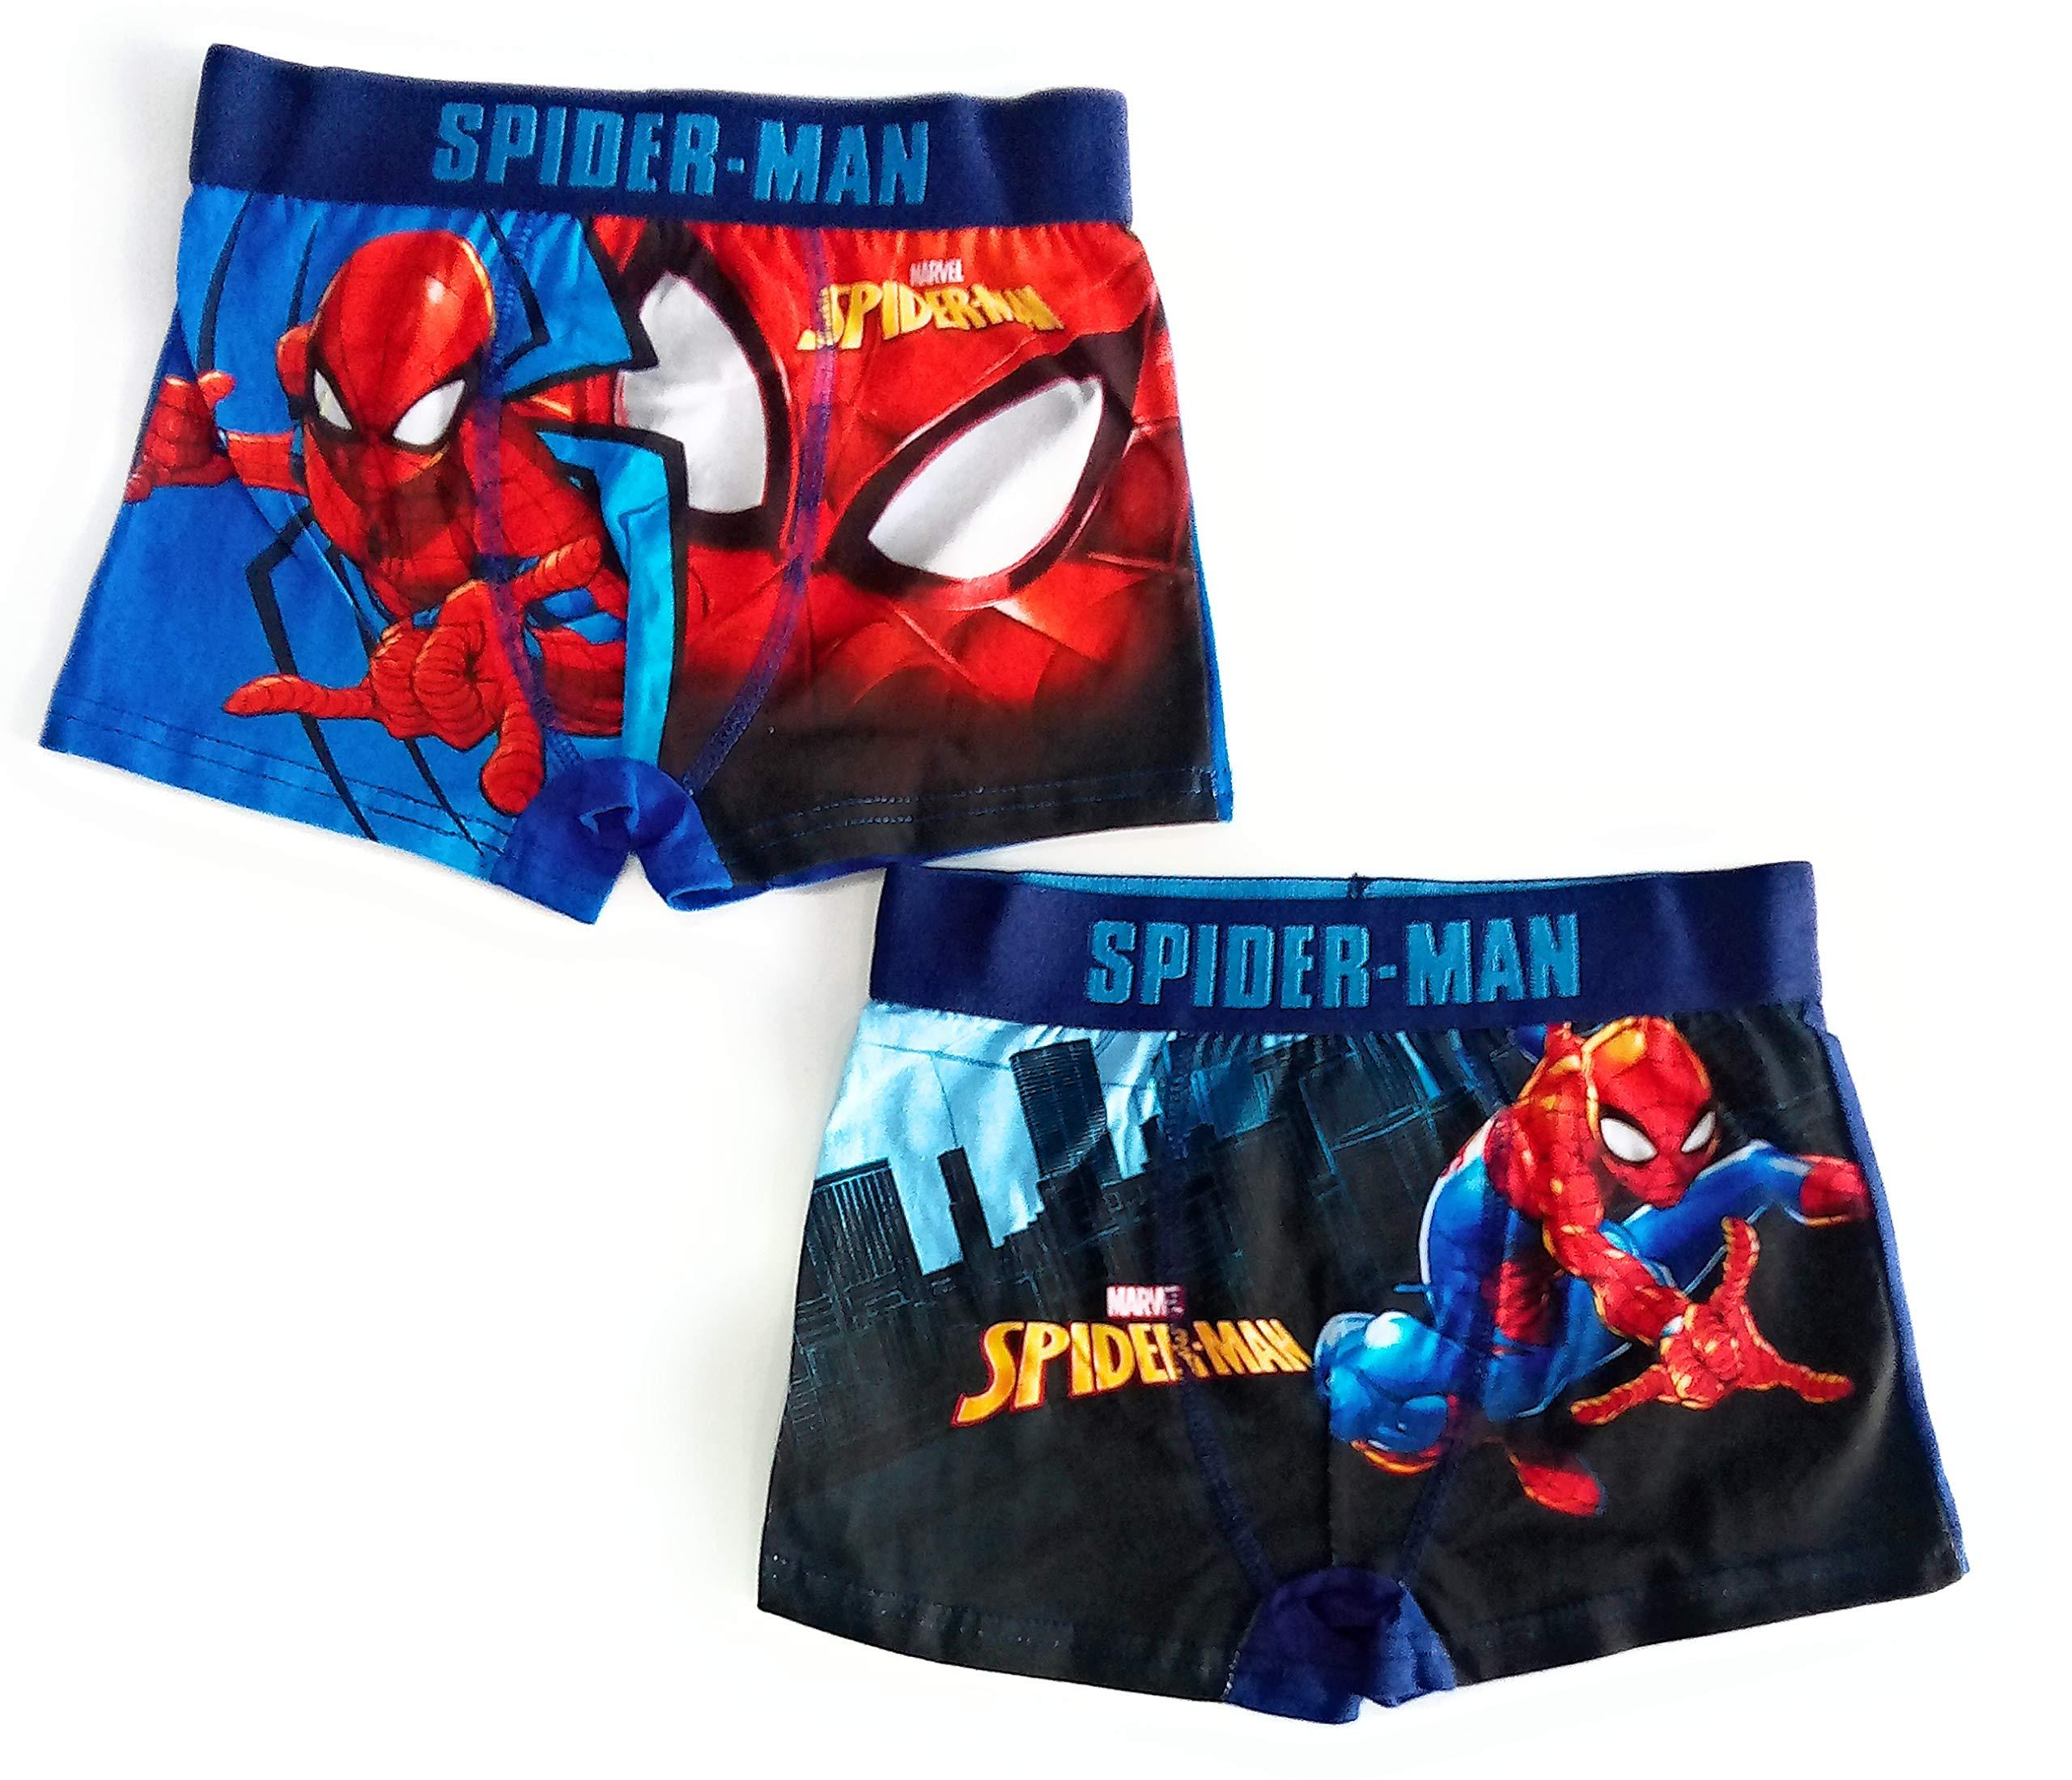 Boxer Spiderman Calzoncillos (Pack de 2)